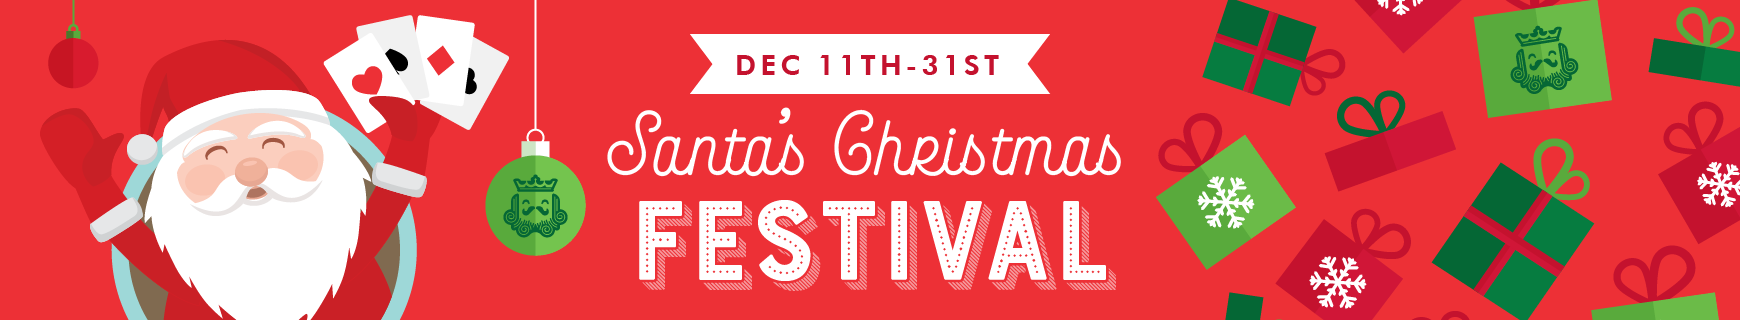 Santa's chrismas festival %28870 x 160%29 v2 2x